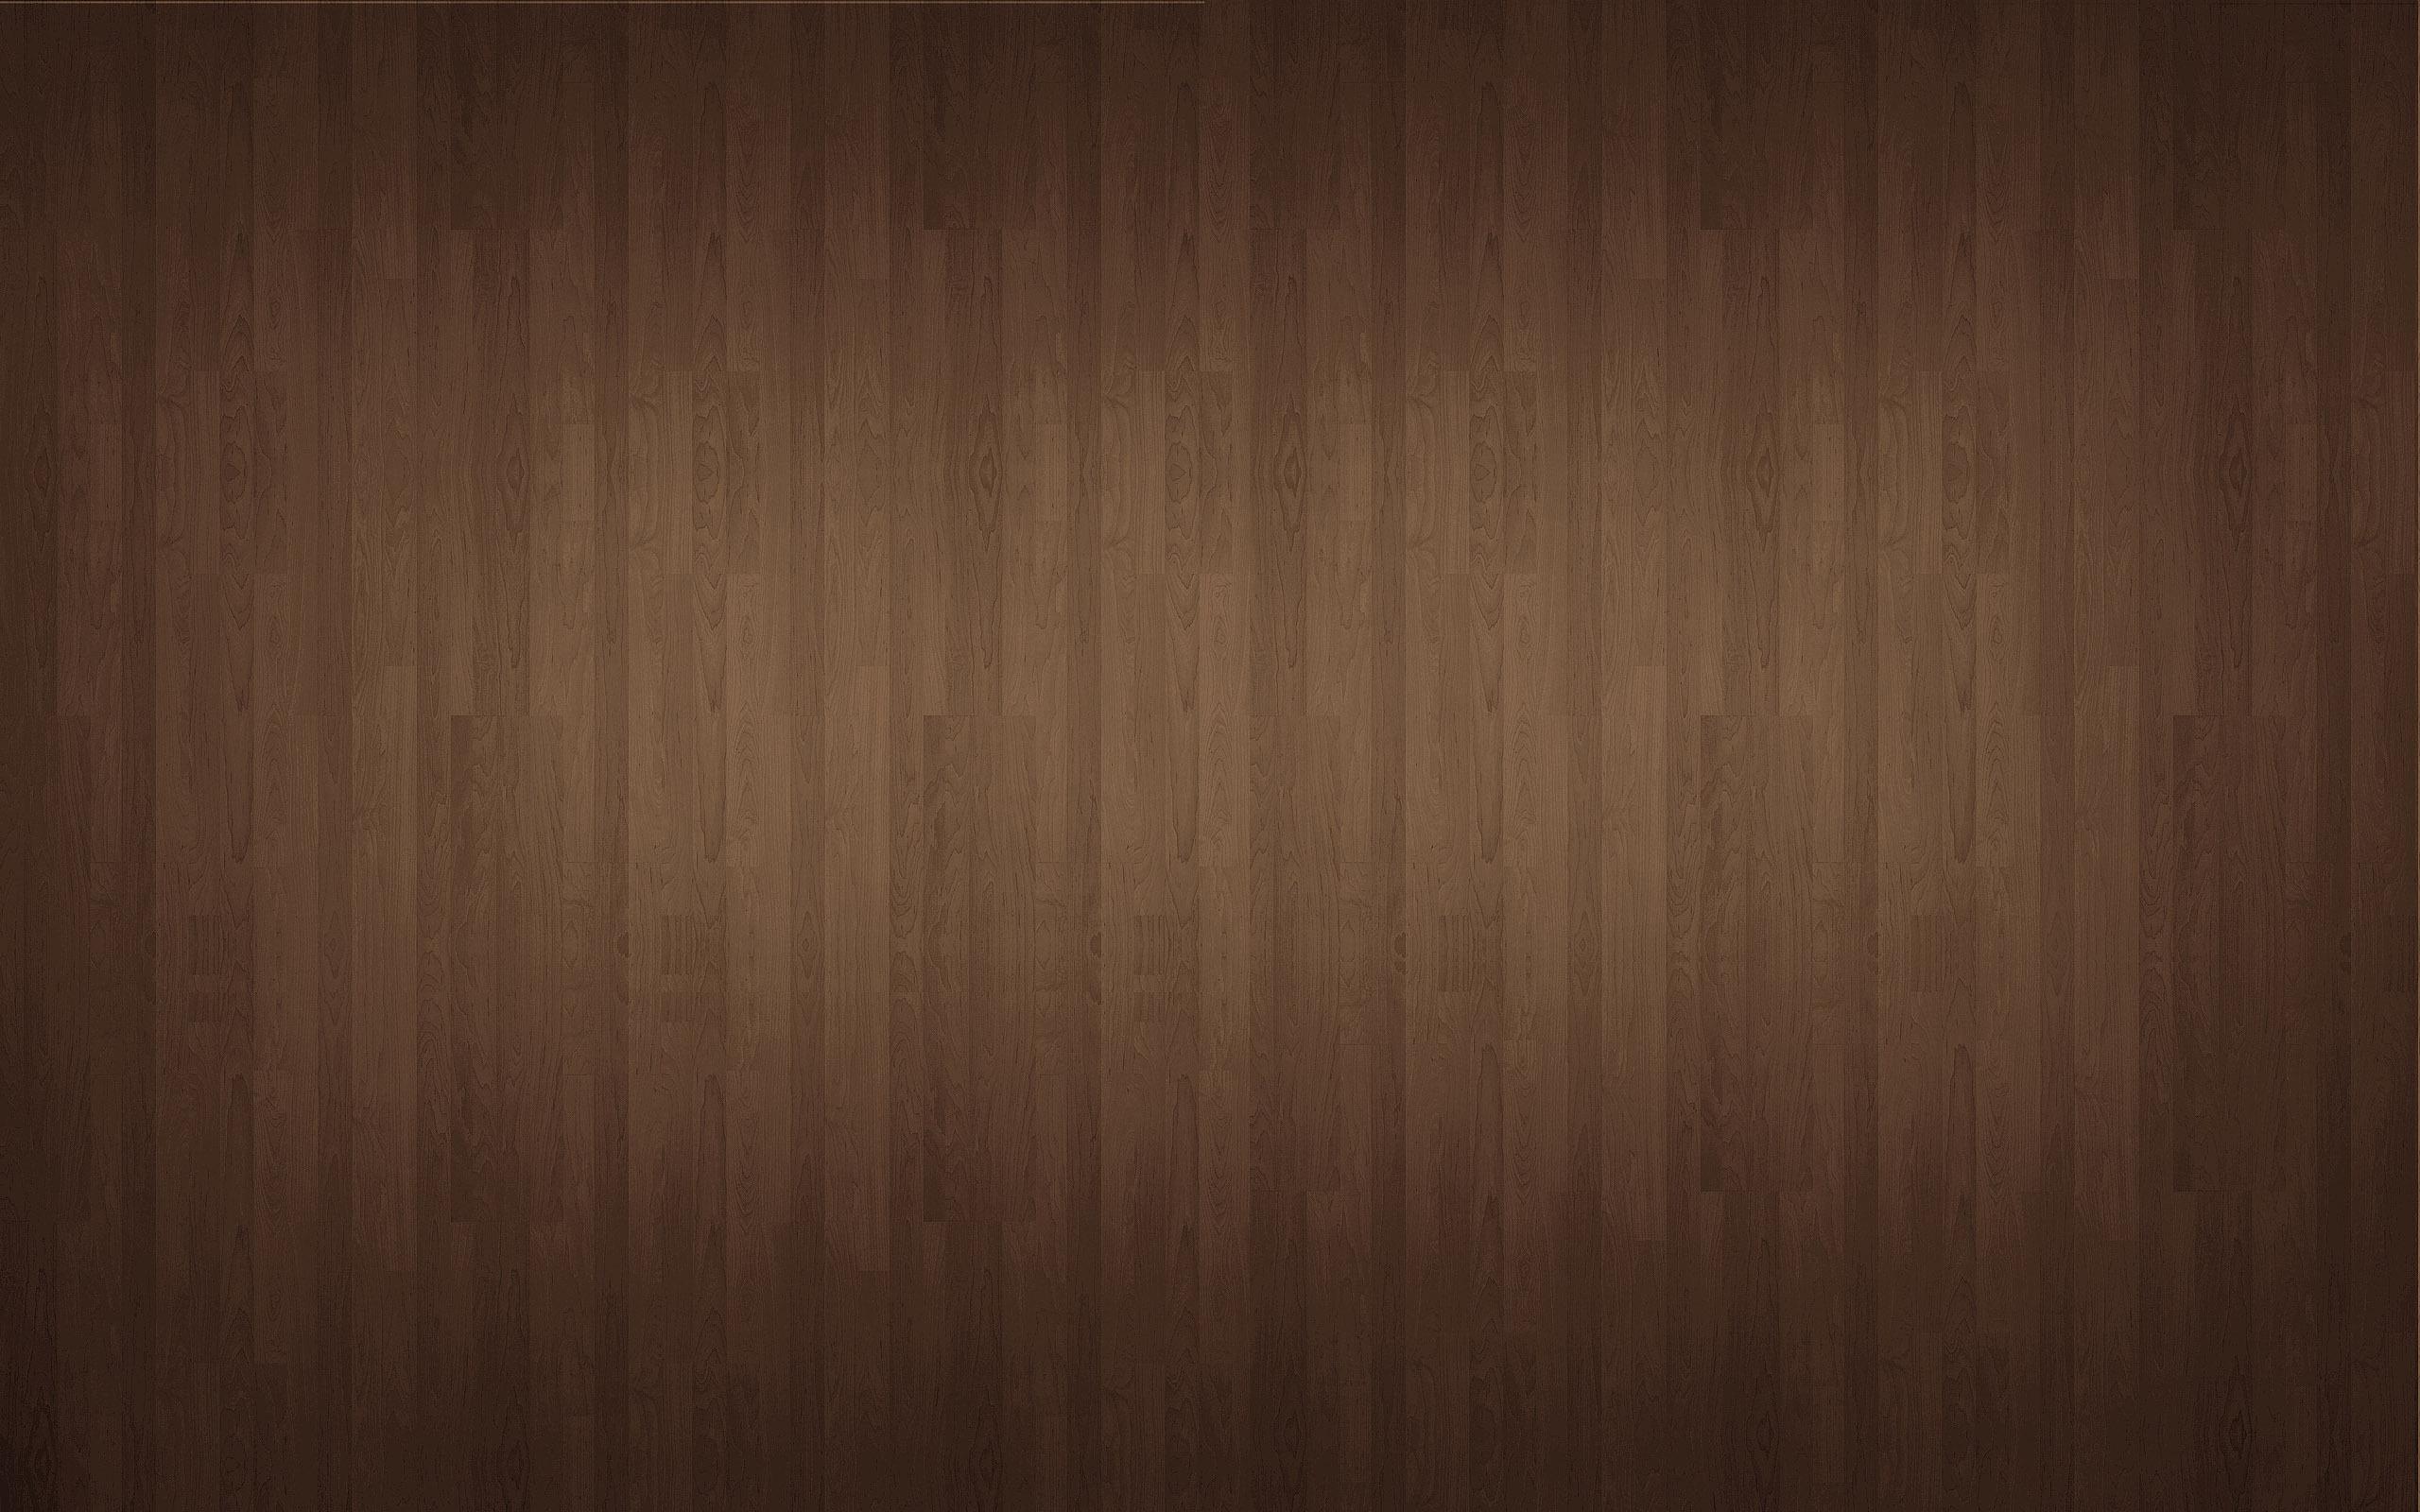 Wallpaper parquet wood simple laminate desktop wallpaper 2560x1600